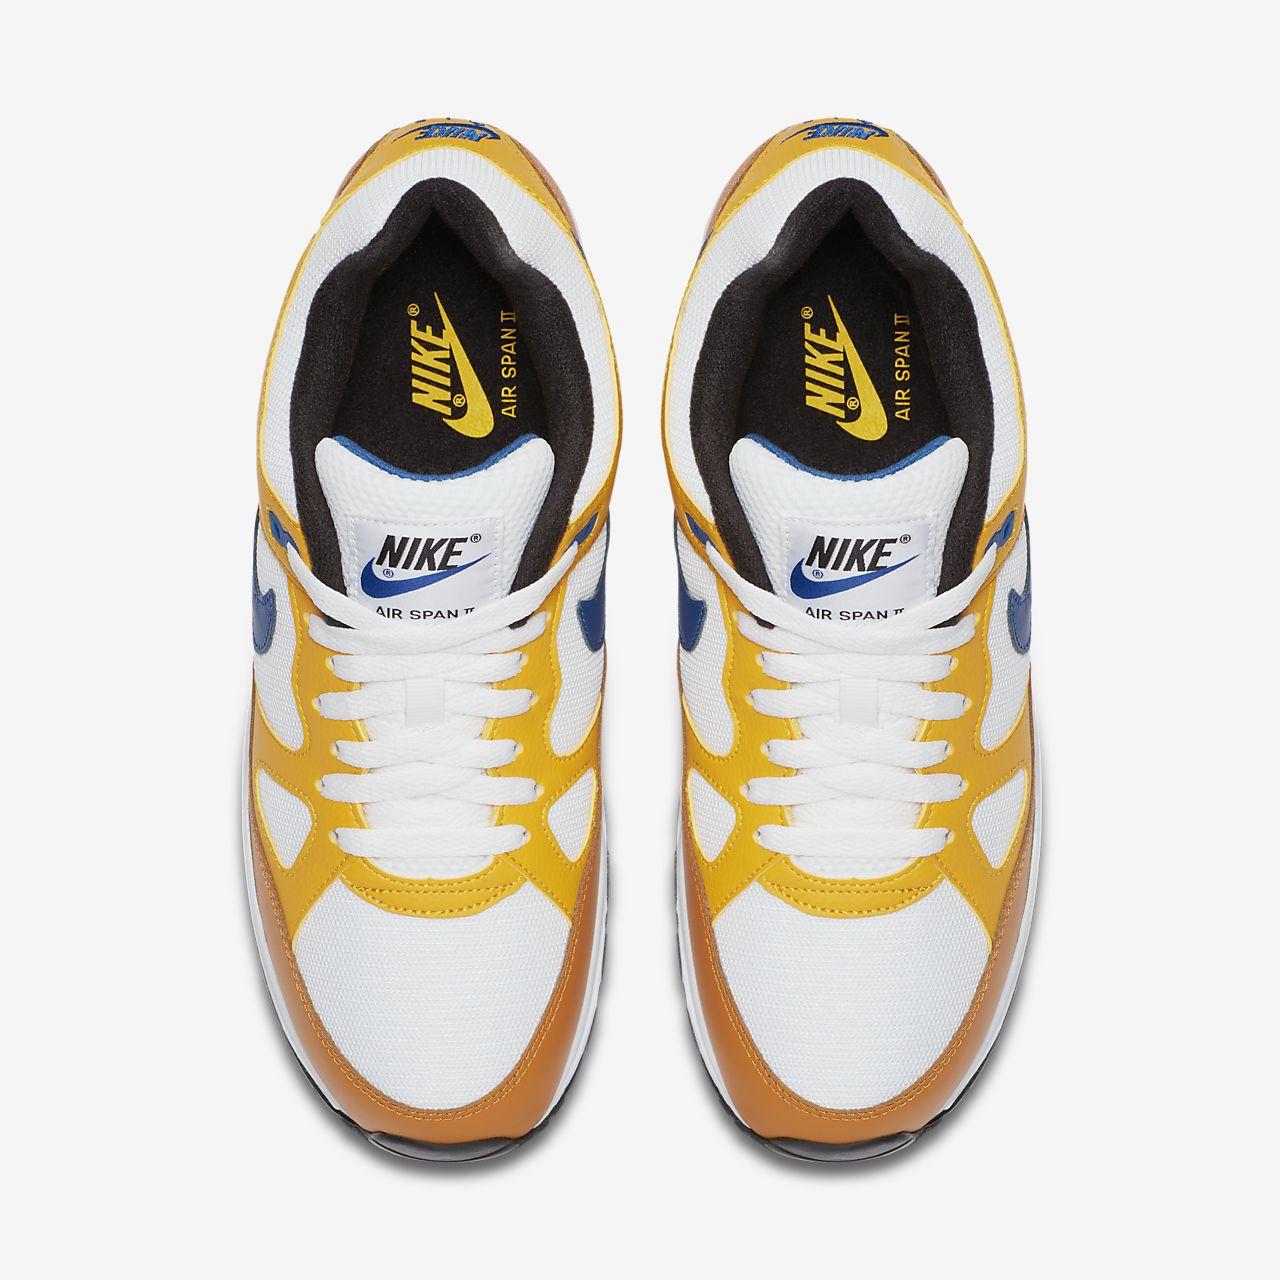 9545466758f Nike Air Span II Men s Shoe. Nike.com GB